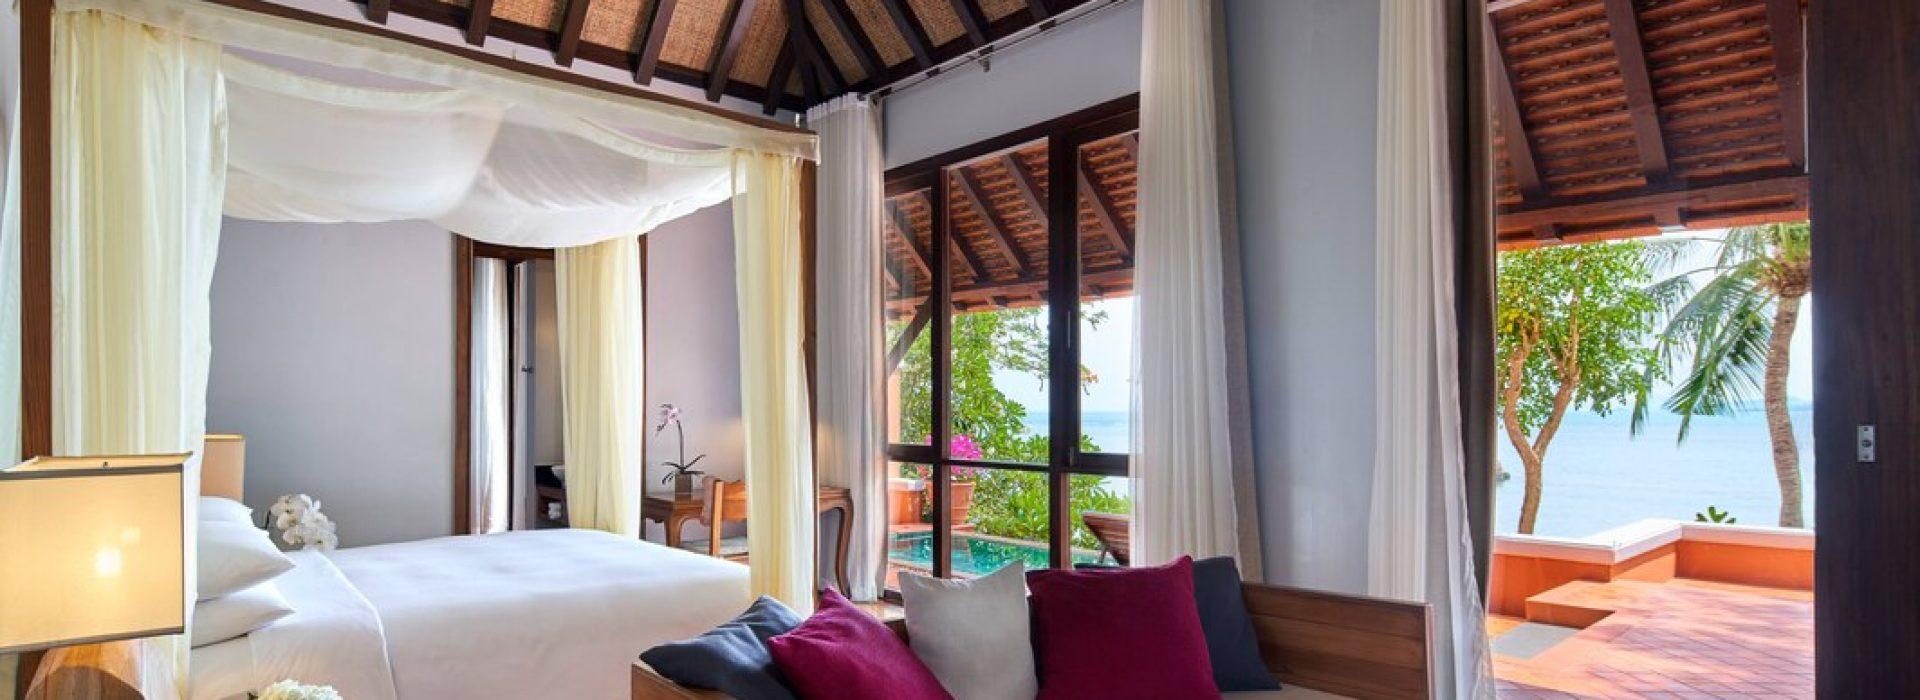 usmbr-beachfront-bedroom-9336-hor-wide